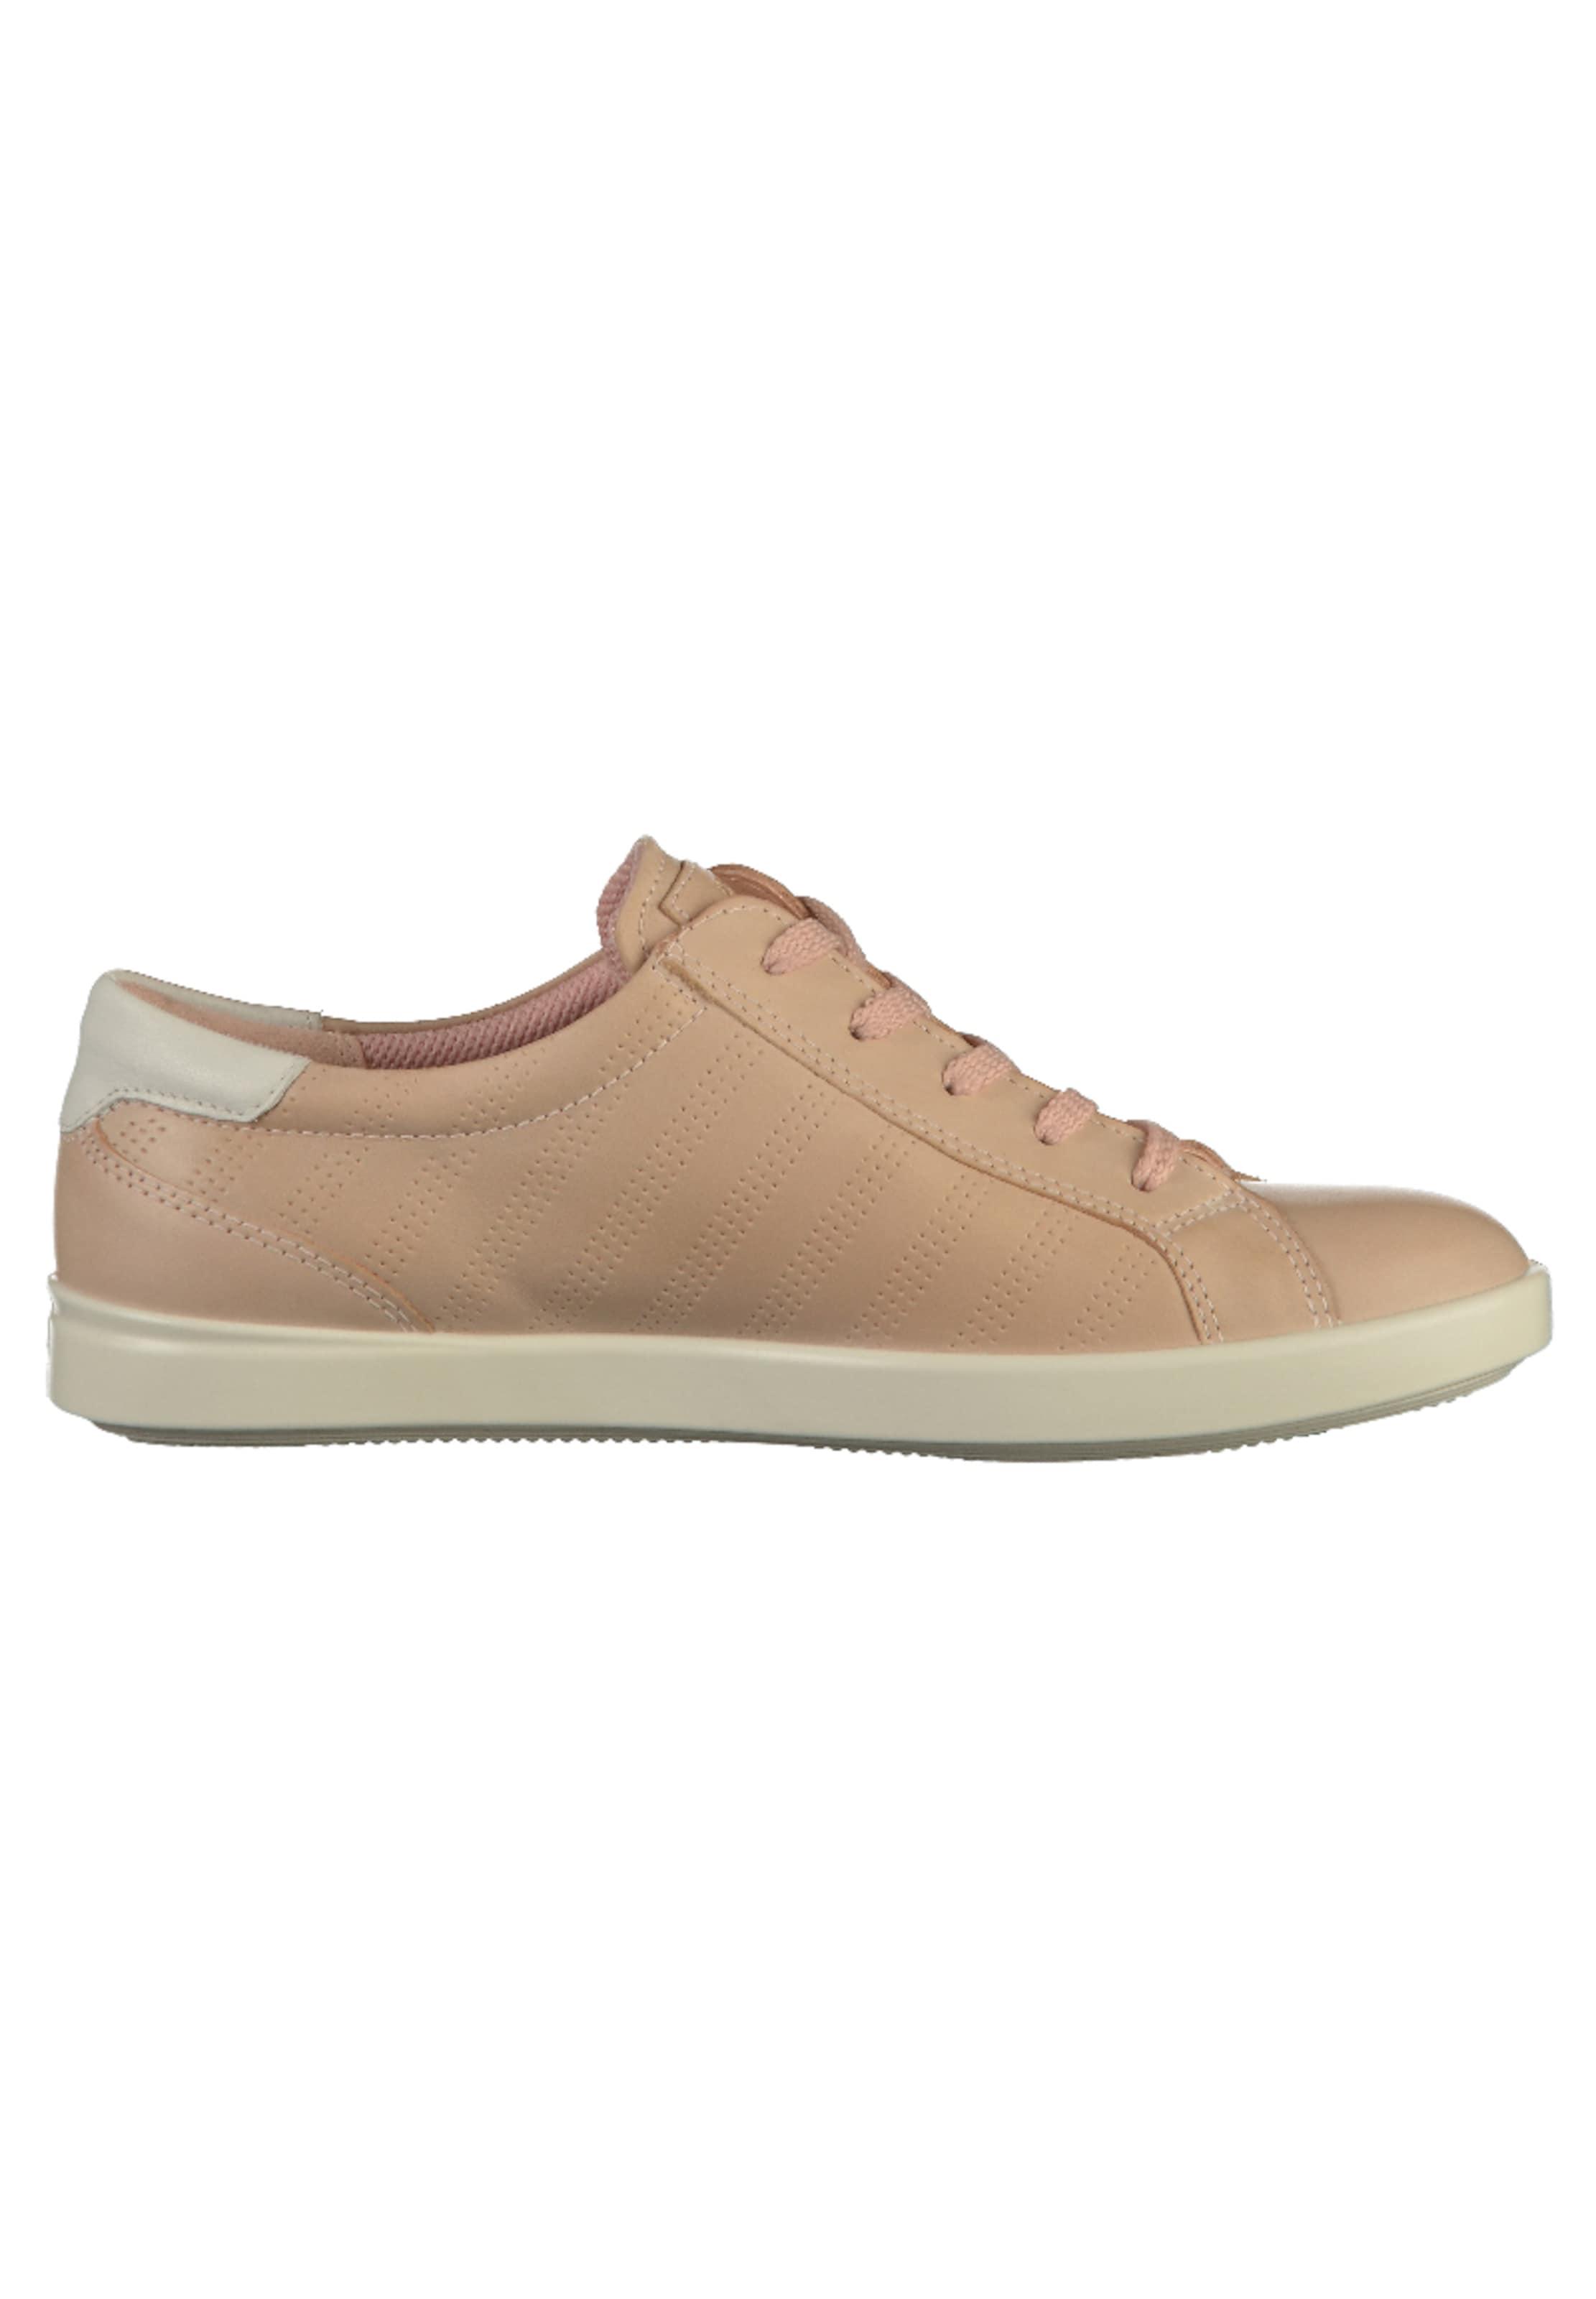 Sneaker Ecco In Sneaker Sneaker In Ecco Puder Puder Ecco 0nwPOk